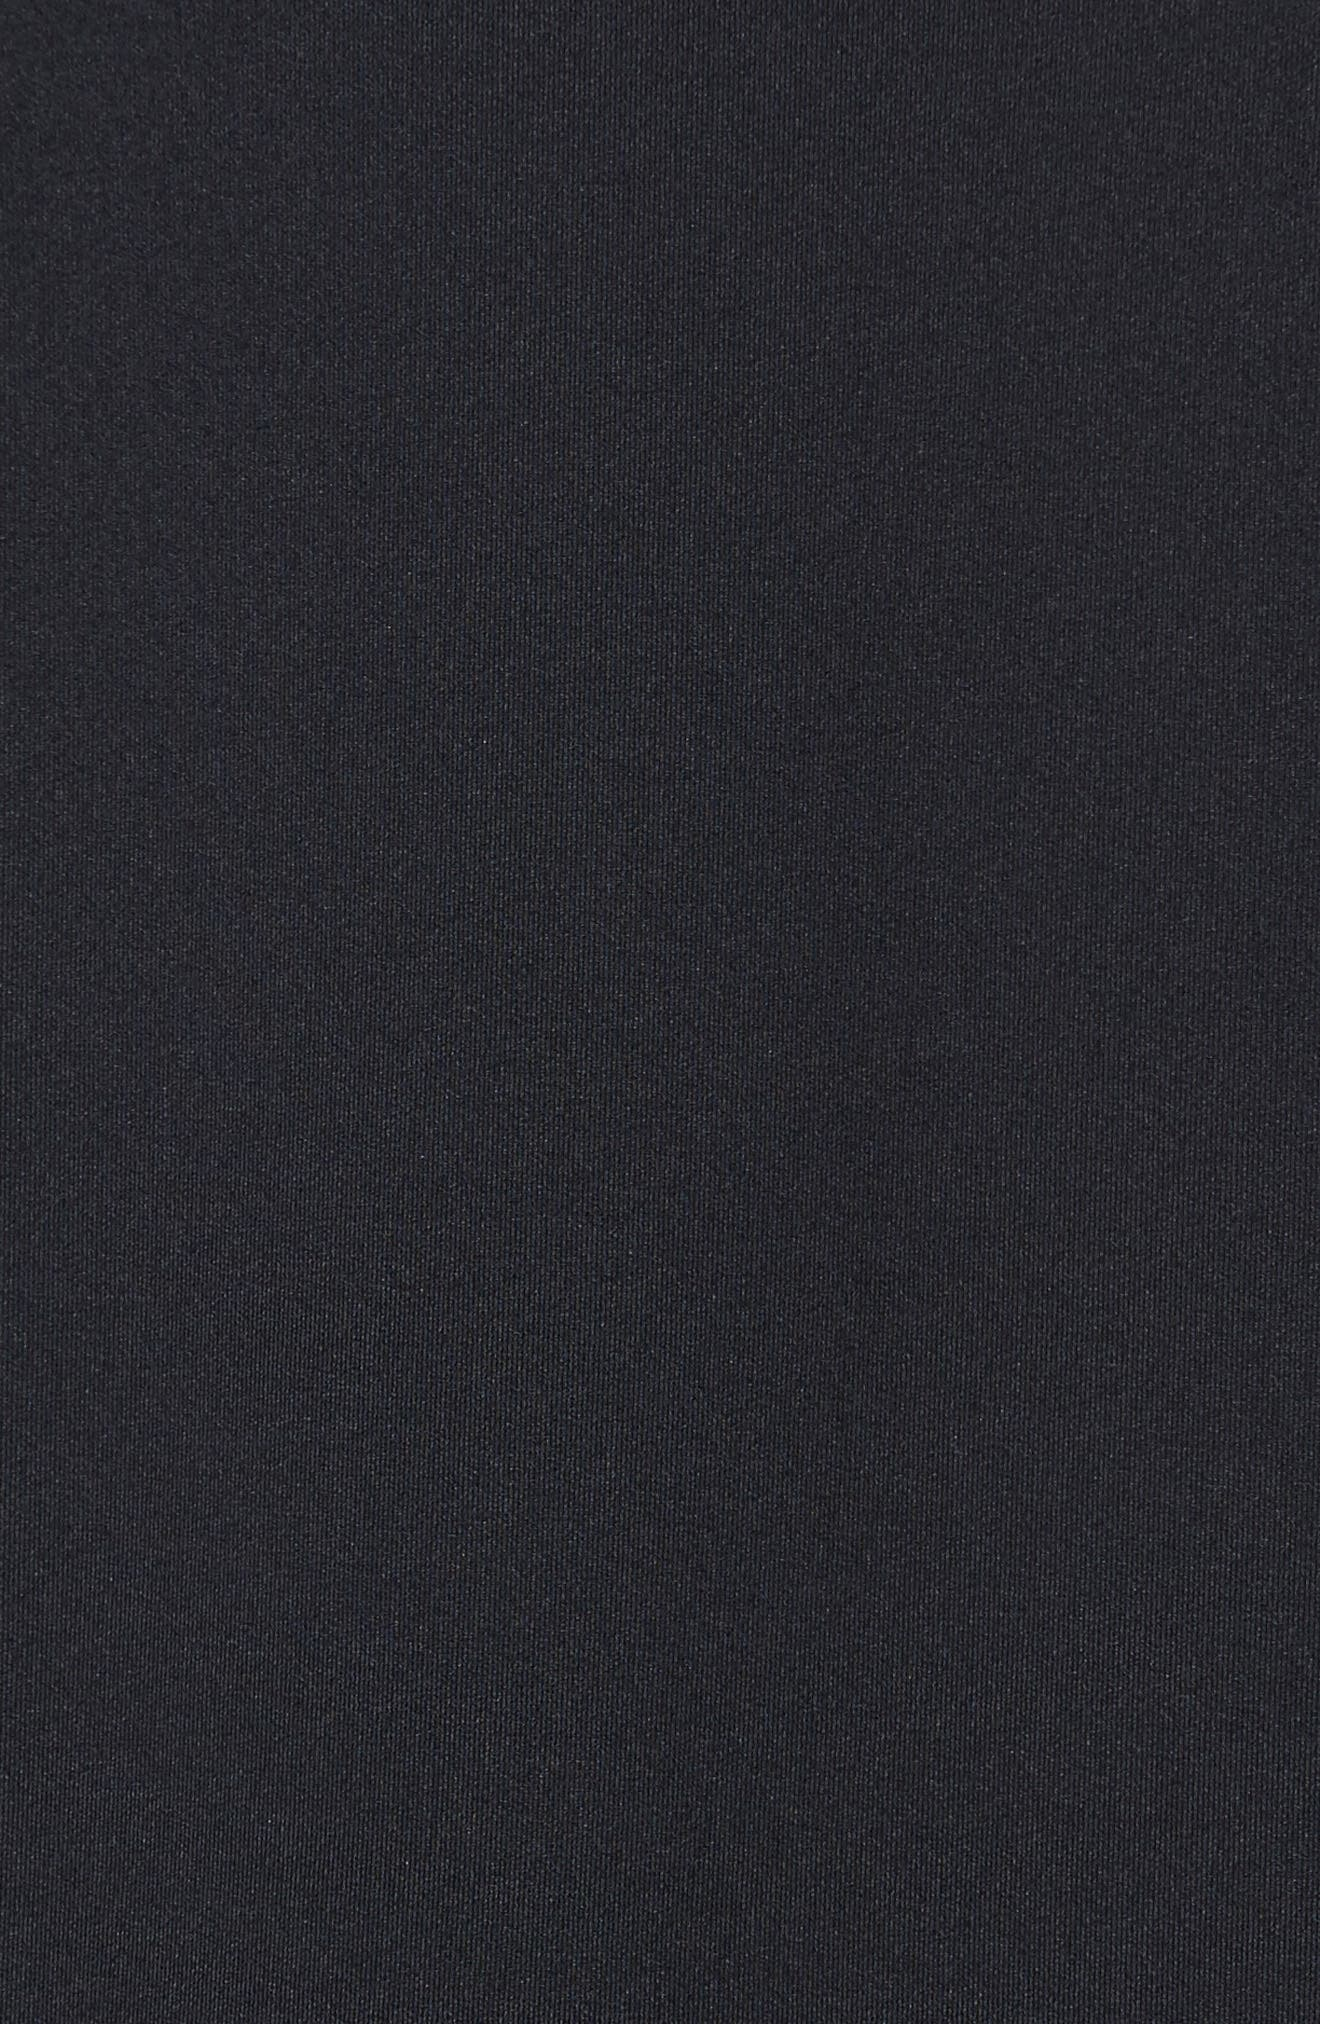 Sportstyle Track Jacket,                             Alternate thumbnail 5, color,                             Black / / Black